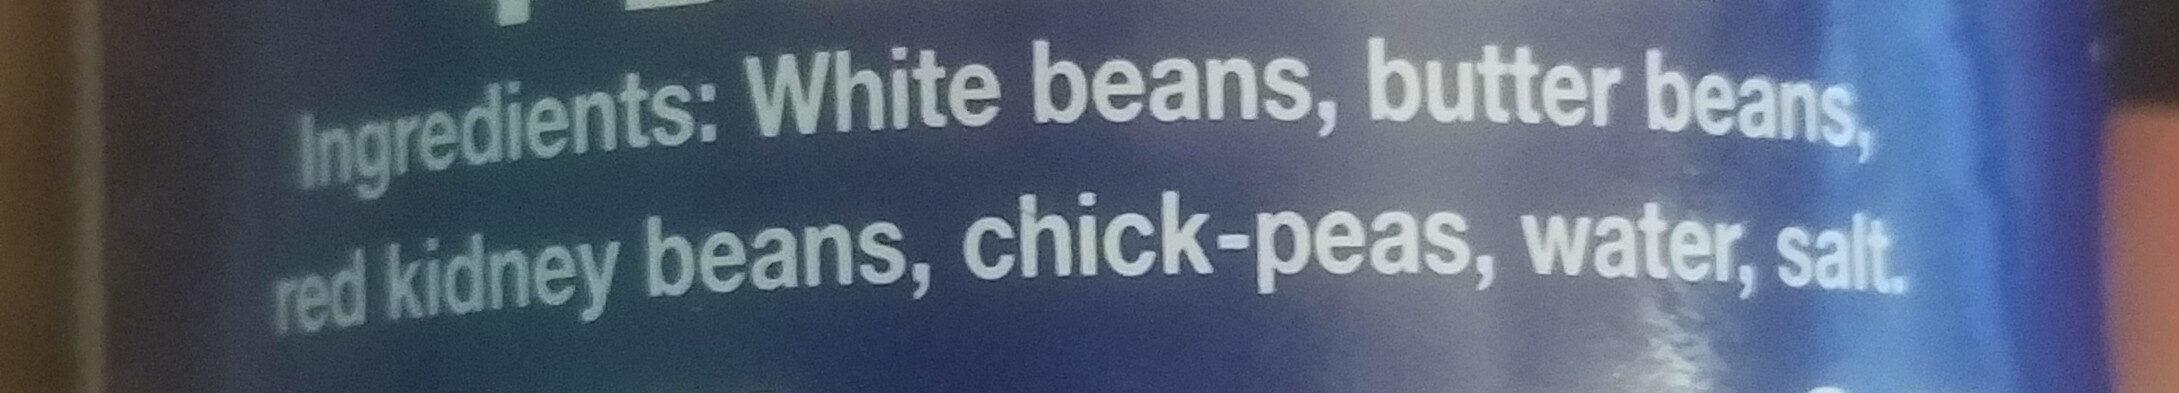 4 Bean Mix - Ingredients - en